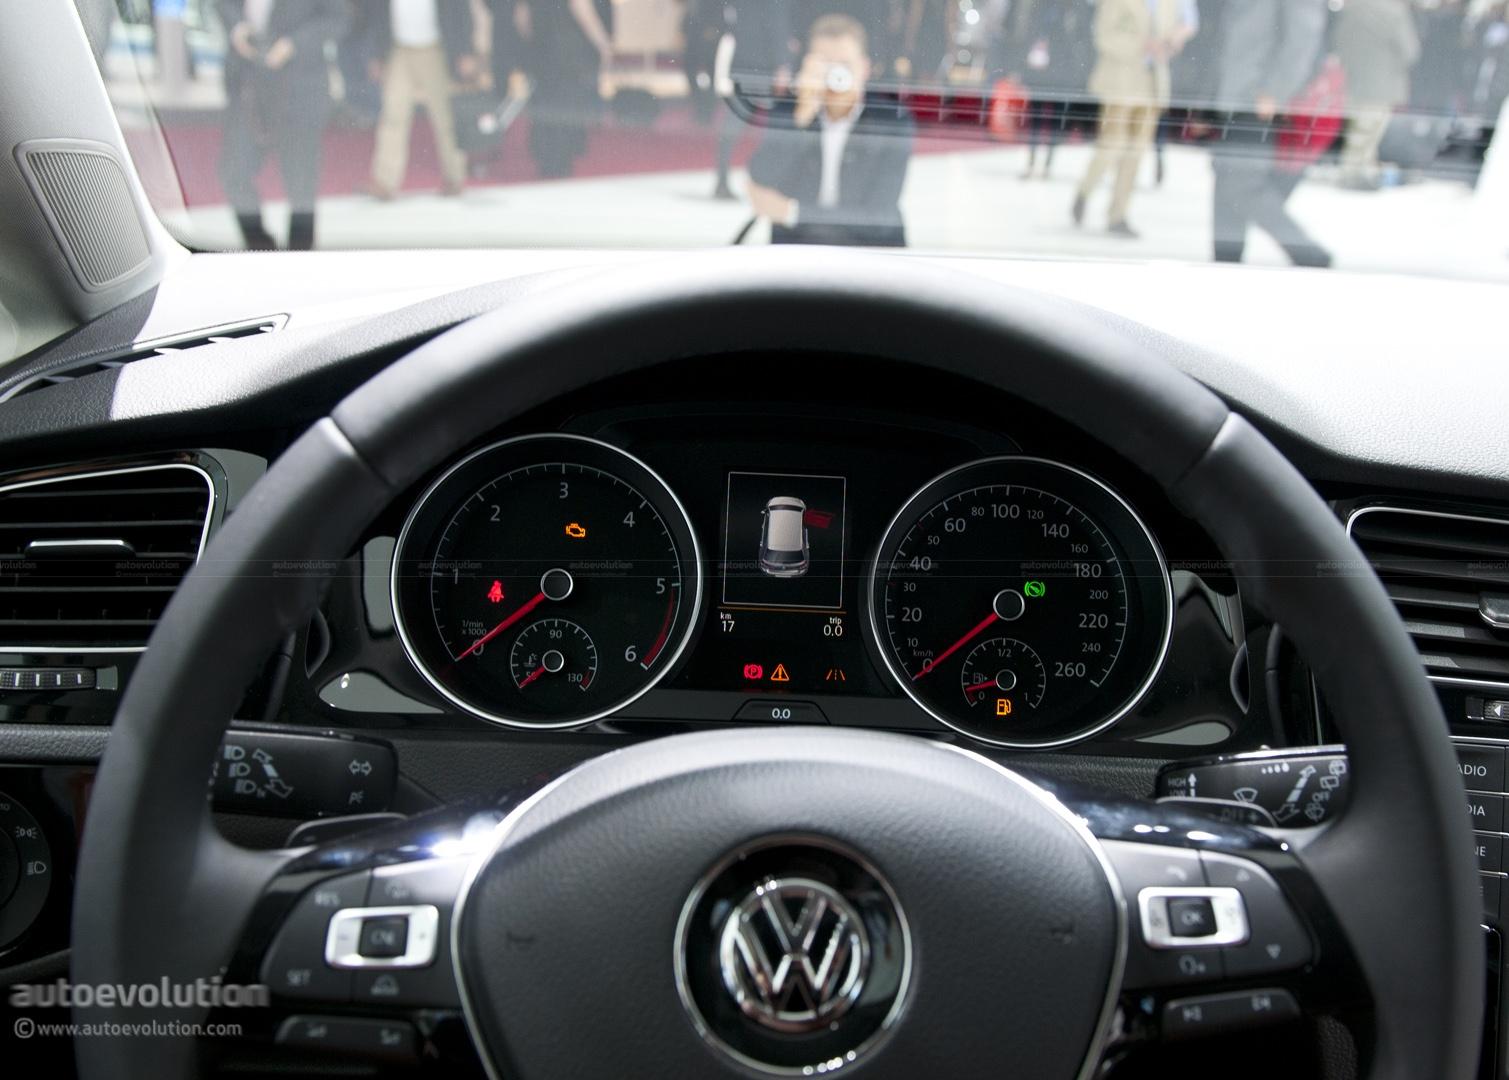 Paris 2012 Volkswagen Golf Vii Live Photos Autoevolution